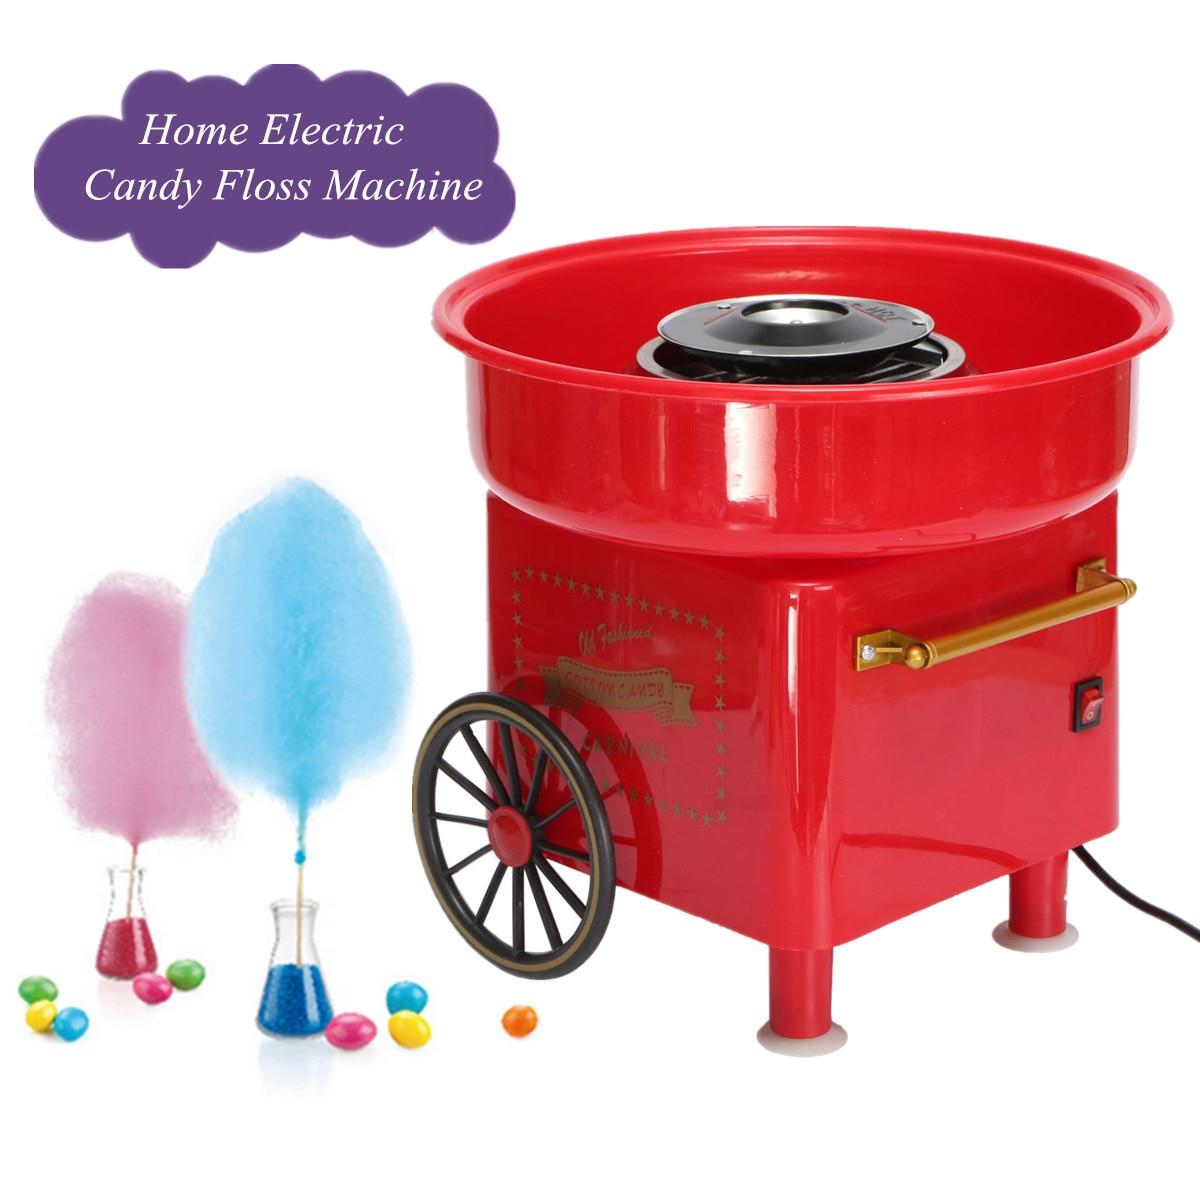 Mini Retro DIY Sweet Cotton Candy Machine Portable Electric Icing Machine Home Party Creatives Gift 450 550W 240V EU Plug|Food Processors| |  - title=